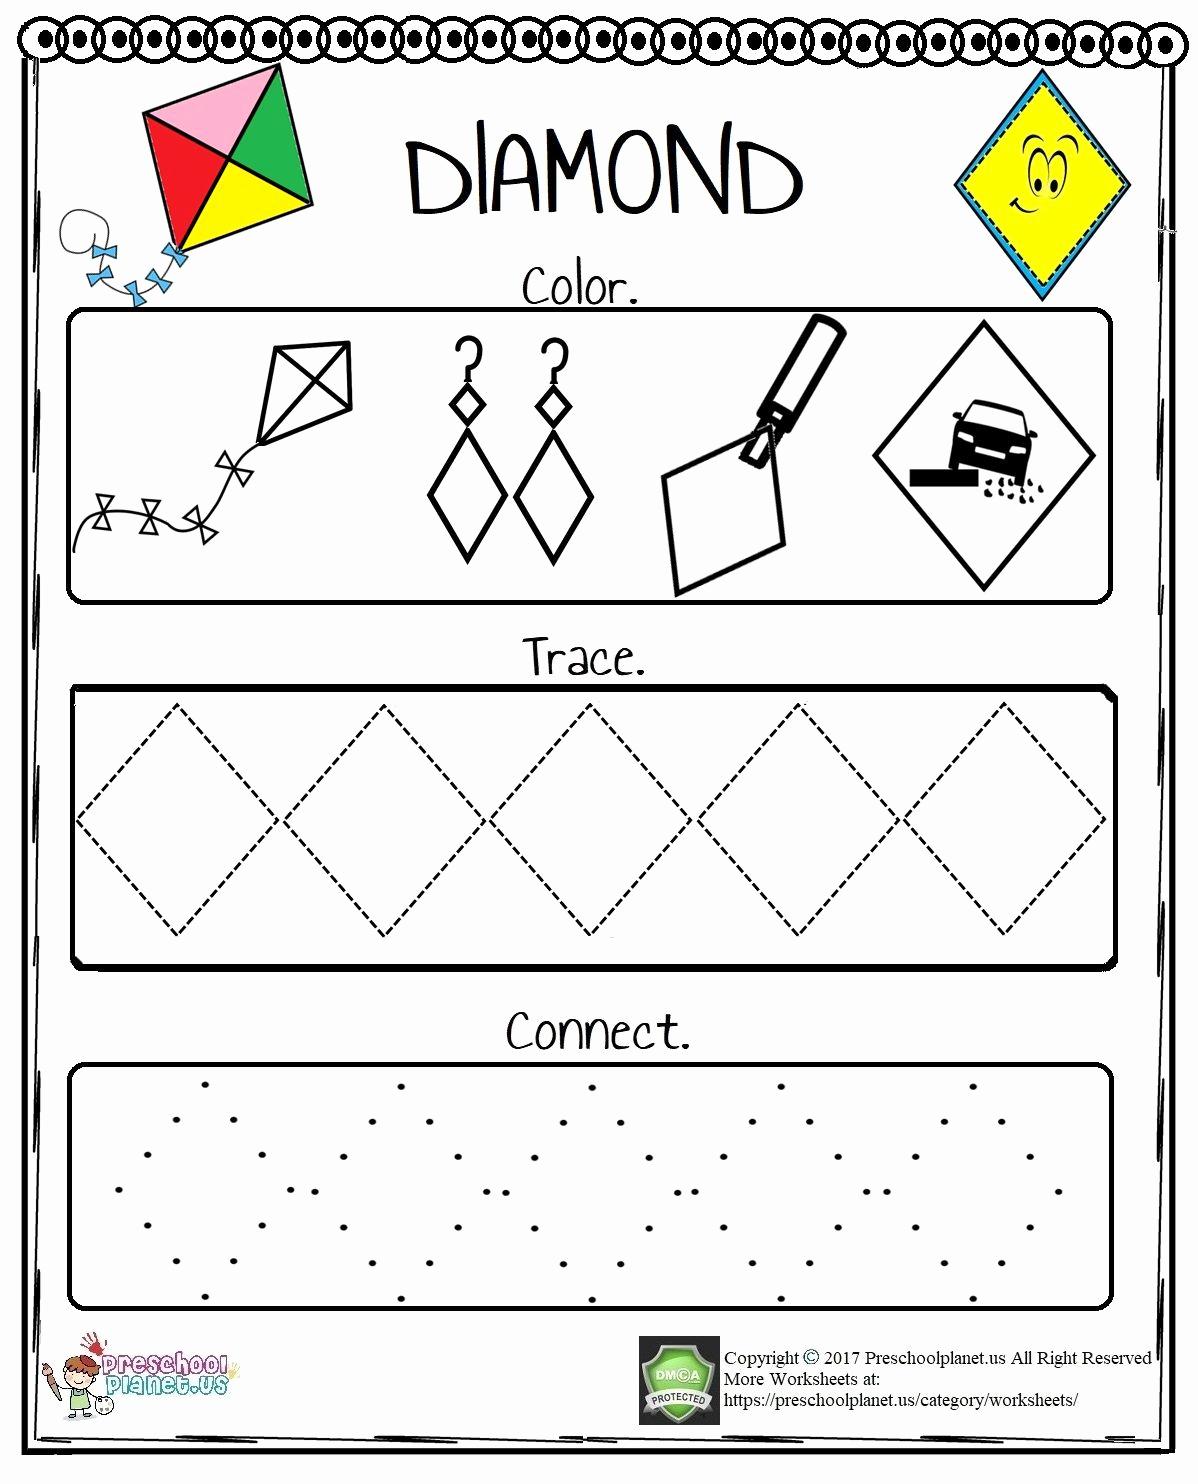 Preschool Diamond Shape Worksheets Fresh It is Very Easy to Teach Diamond Shape to Little Ones with